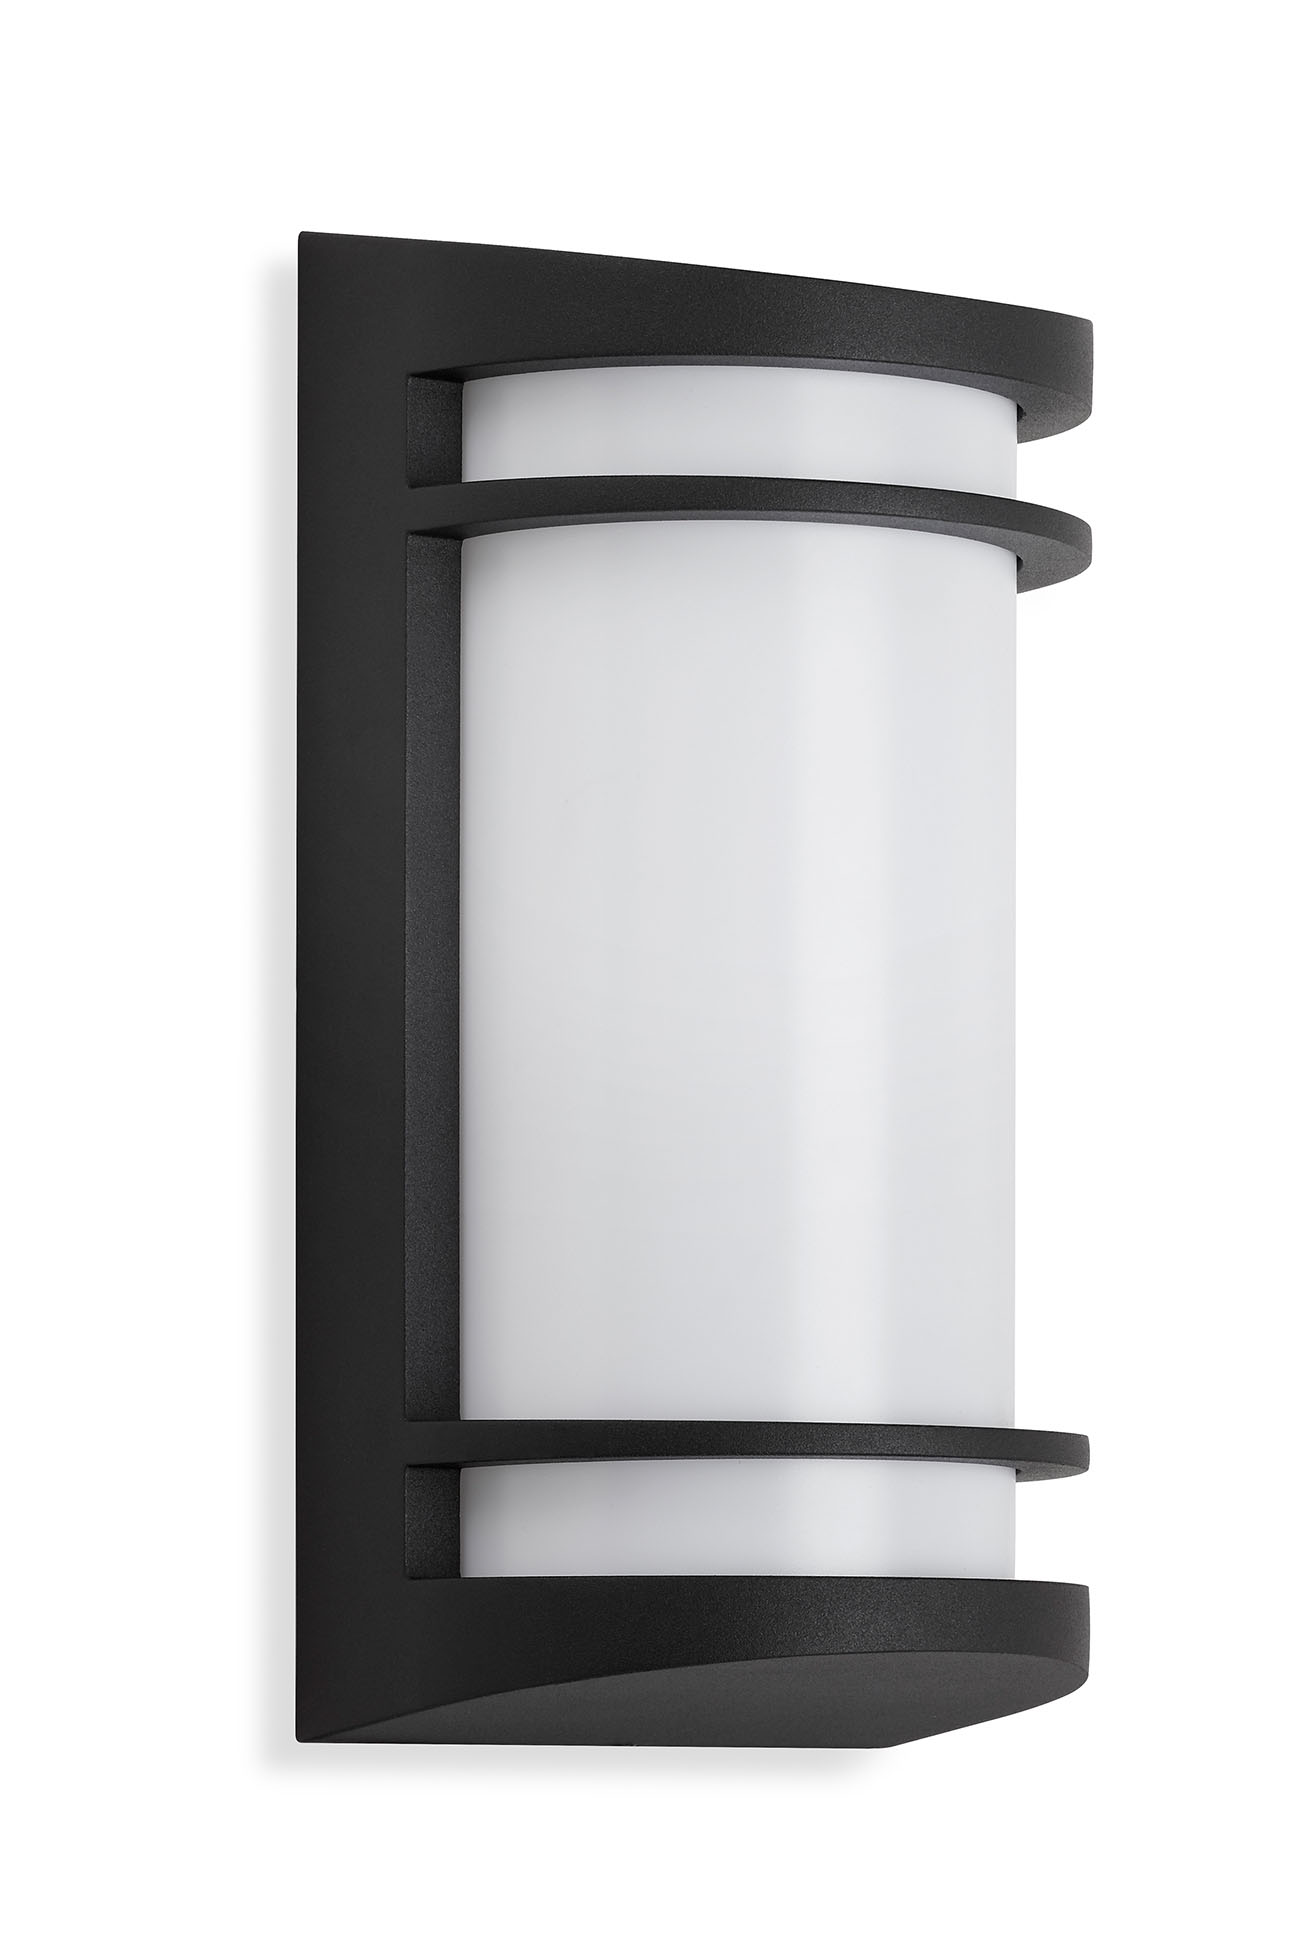 TELEFUNKEN LED Aussenwandleuchte, 14 cm, 10 W, Schwarz